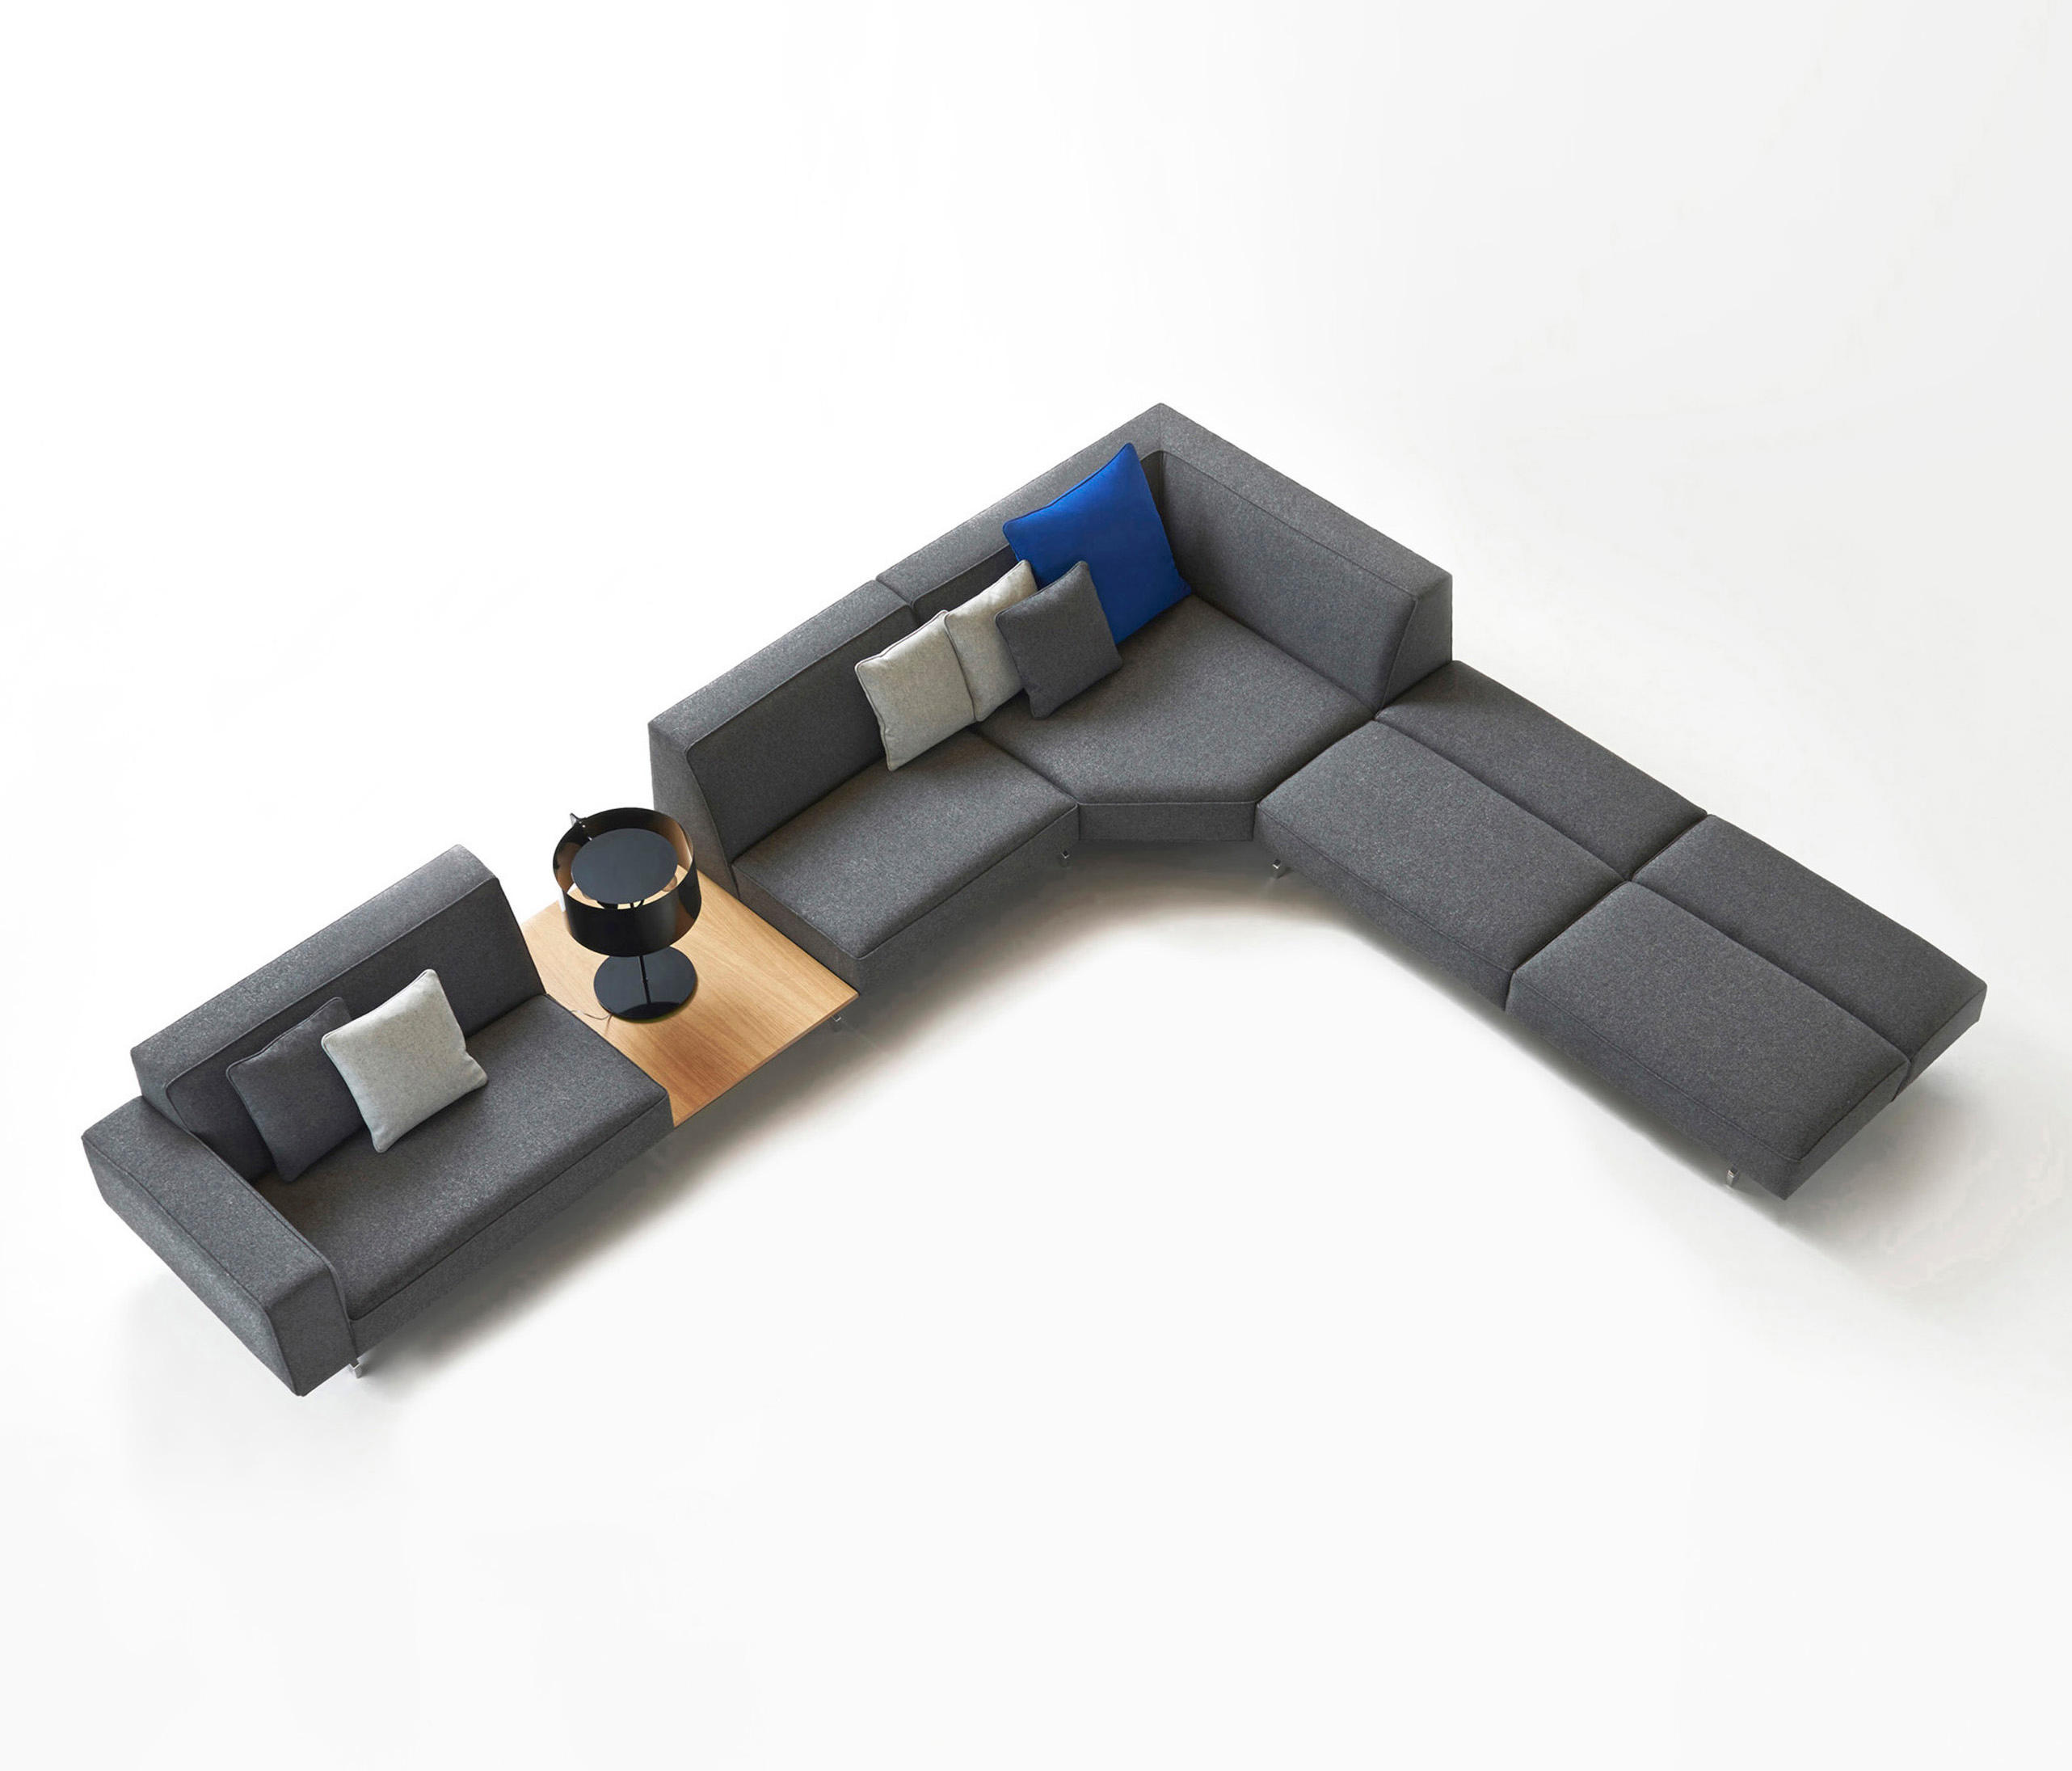 sofa gallery pty ltd crate and barrel microfiber sectional bomba canapés de schiavello international